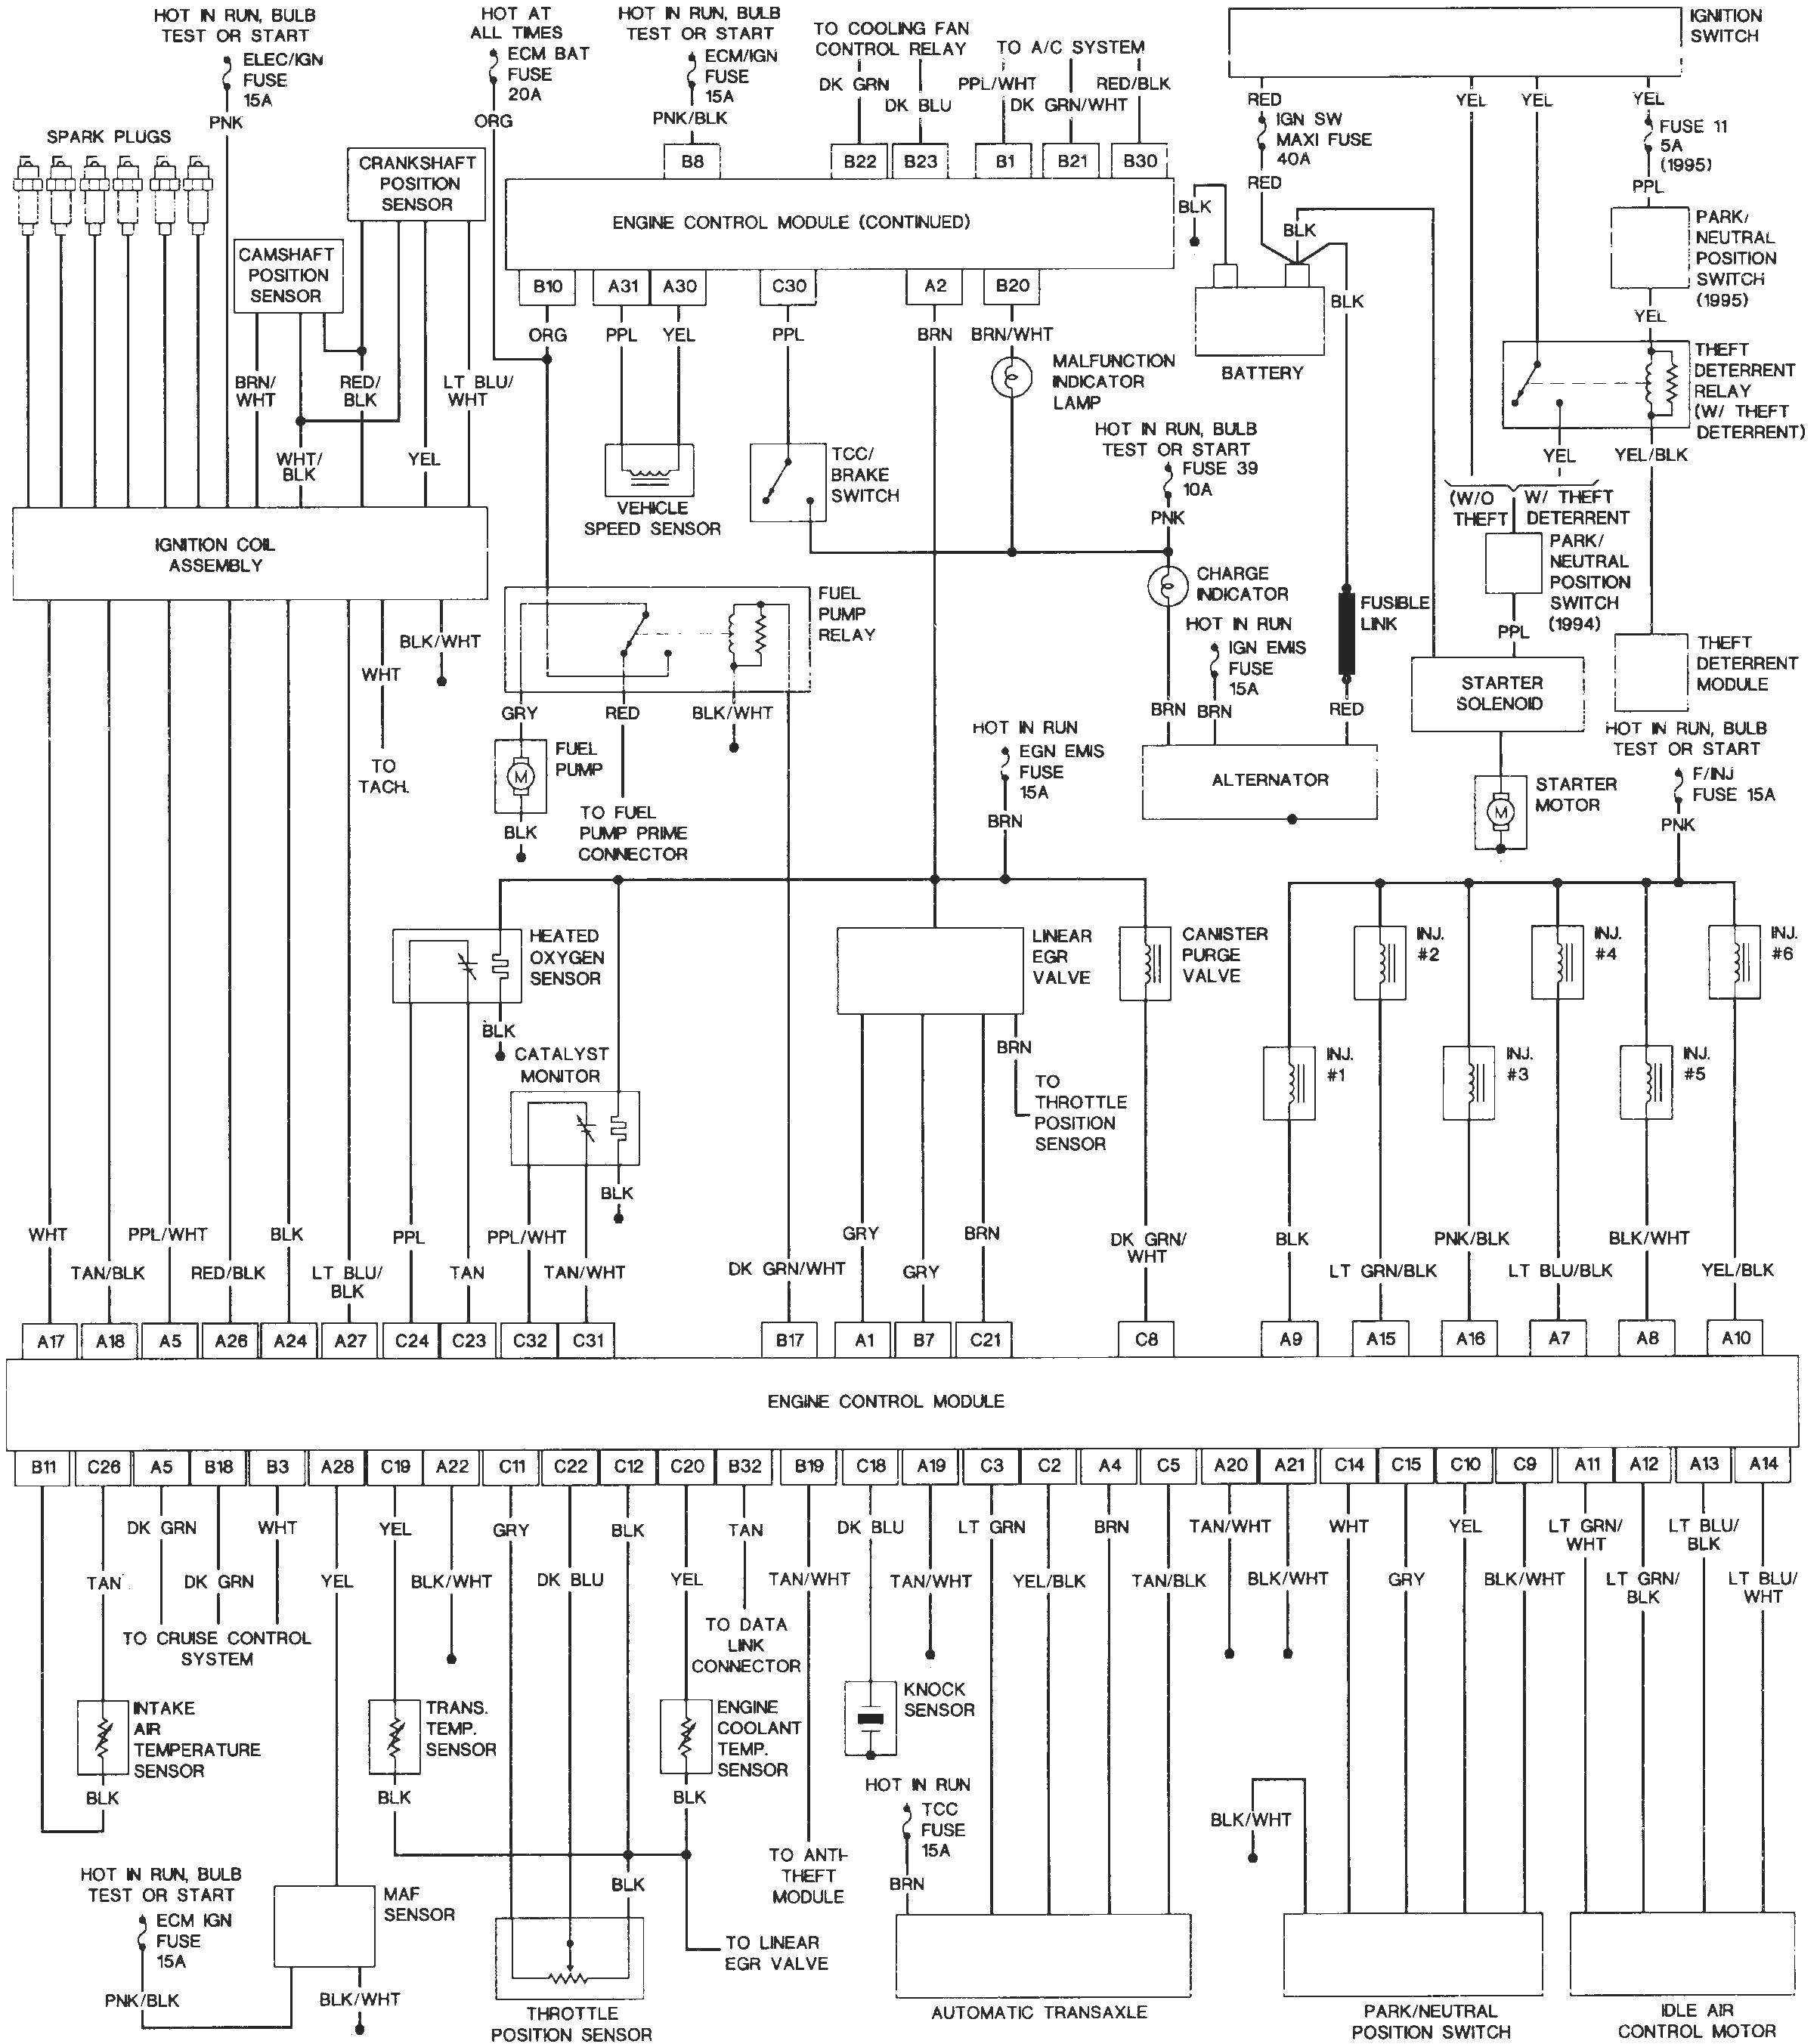 2000 Buick Lesabre Radio Wiring Diagram 2002 Buick Lesabre Radio Wiring Diagram Wiring Diagram